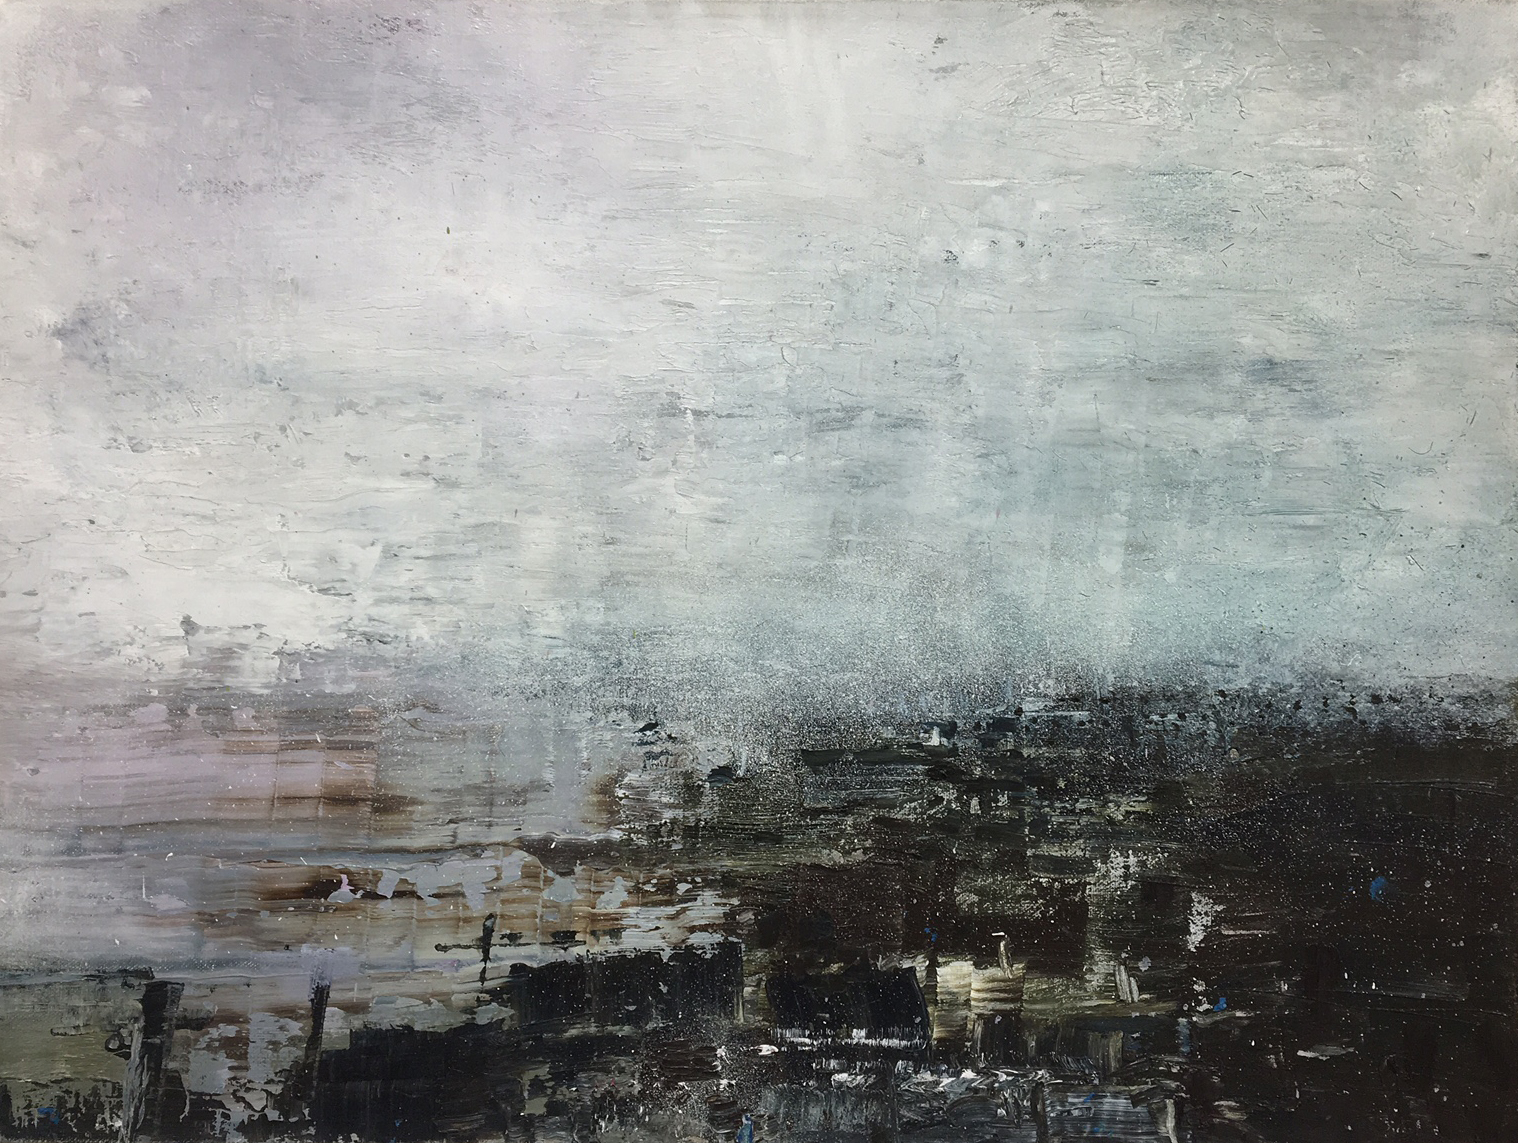 Gareth Edwards RWA  Pink Bay Homecoming 57 x 43 cm oil on canvas £ 1750